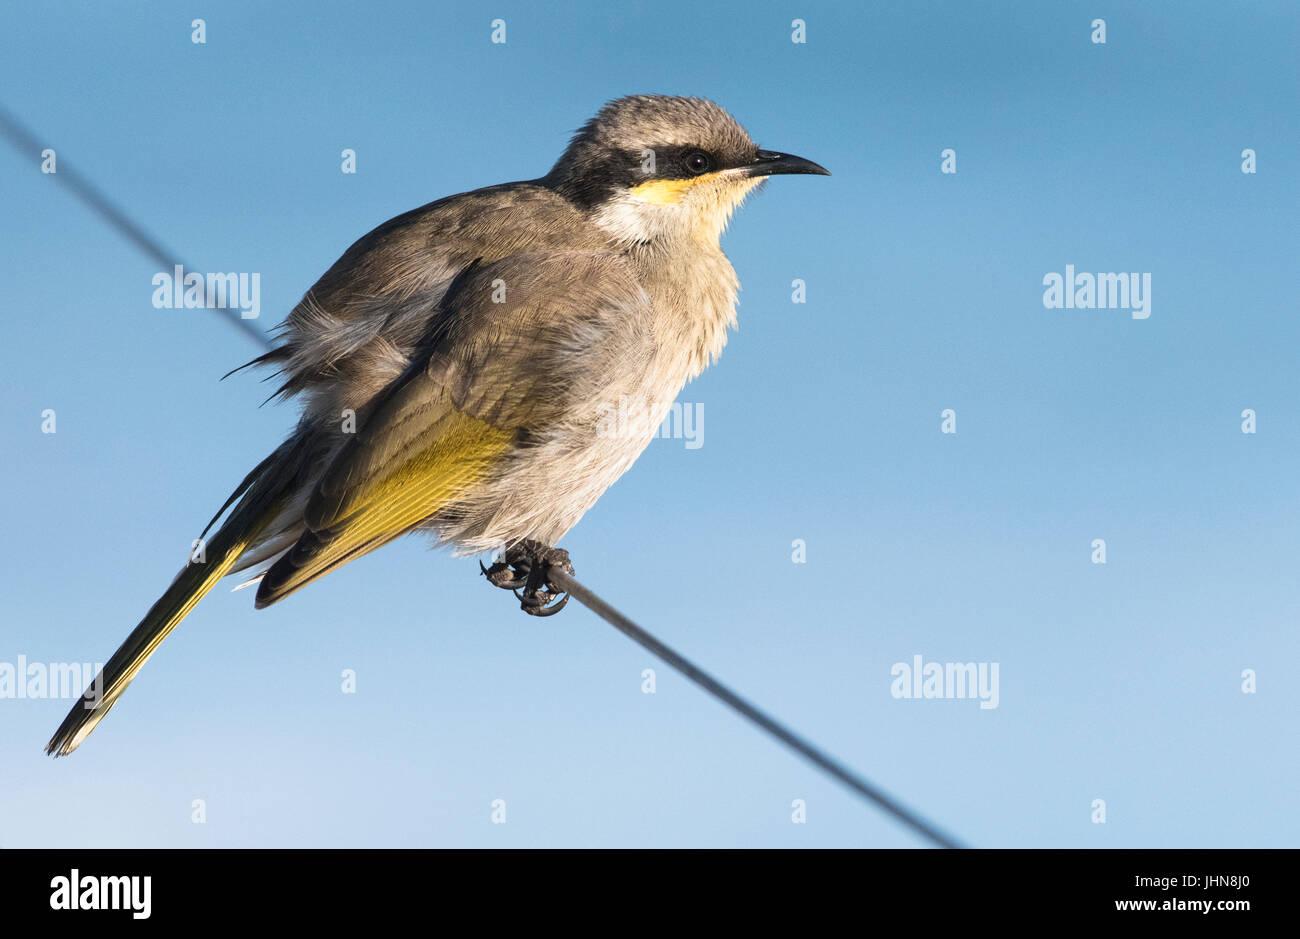 Singing honeyeater (Gavicalis virescens), a common scrubland bird of Australia. - Stock Image